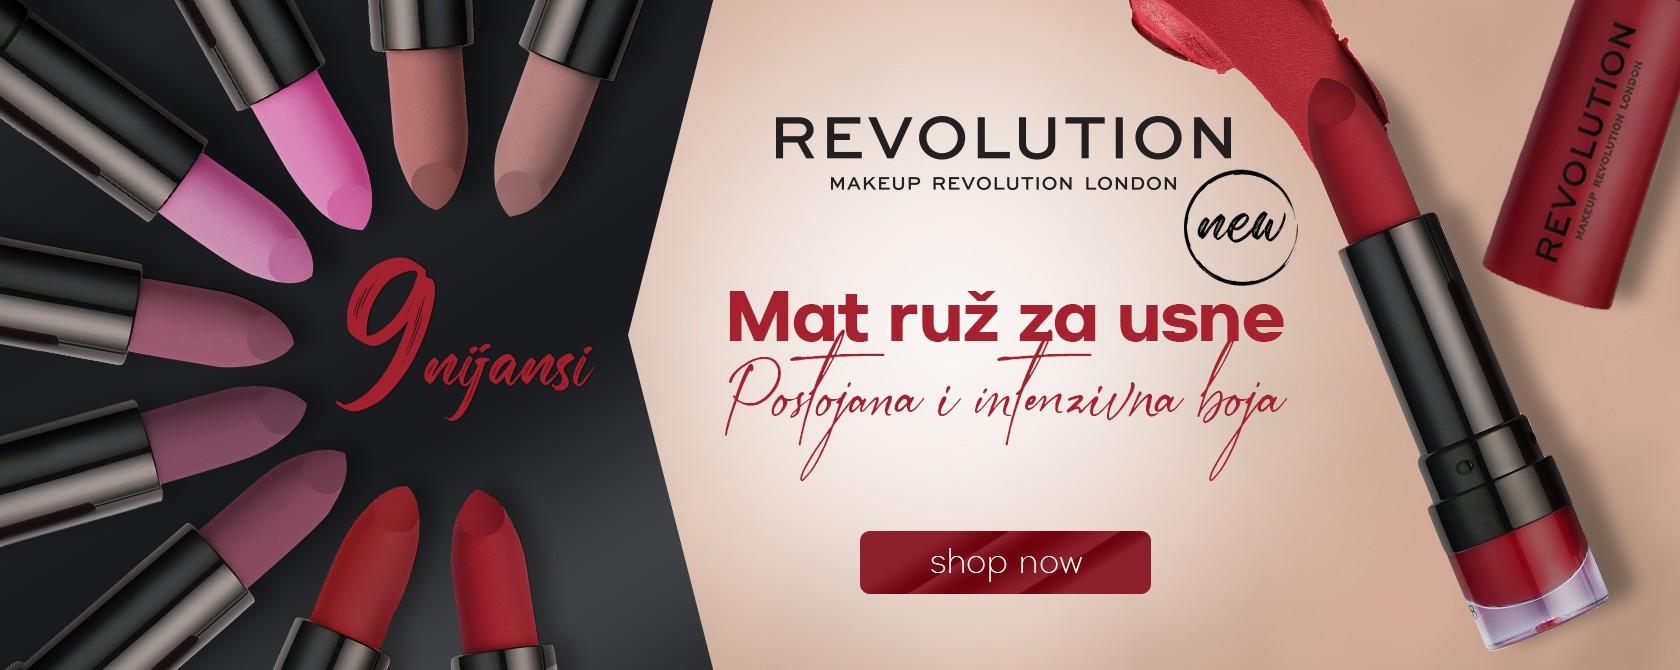 Revolution mat ruž